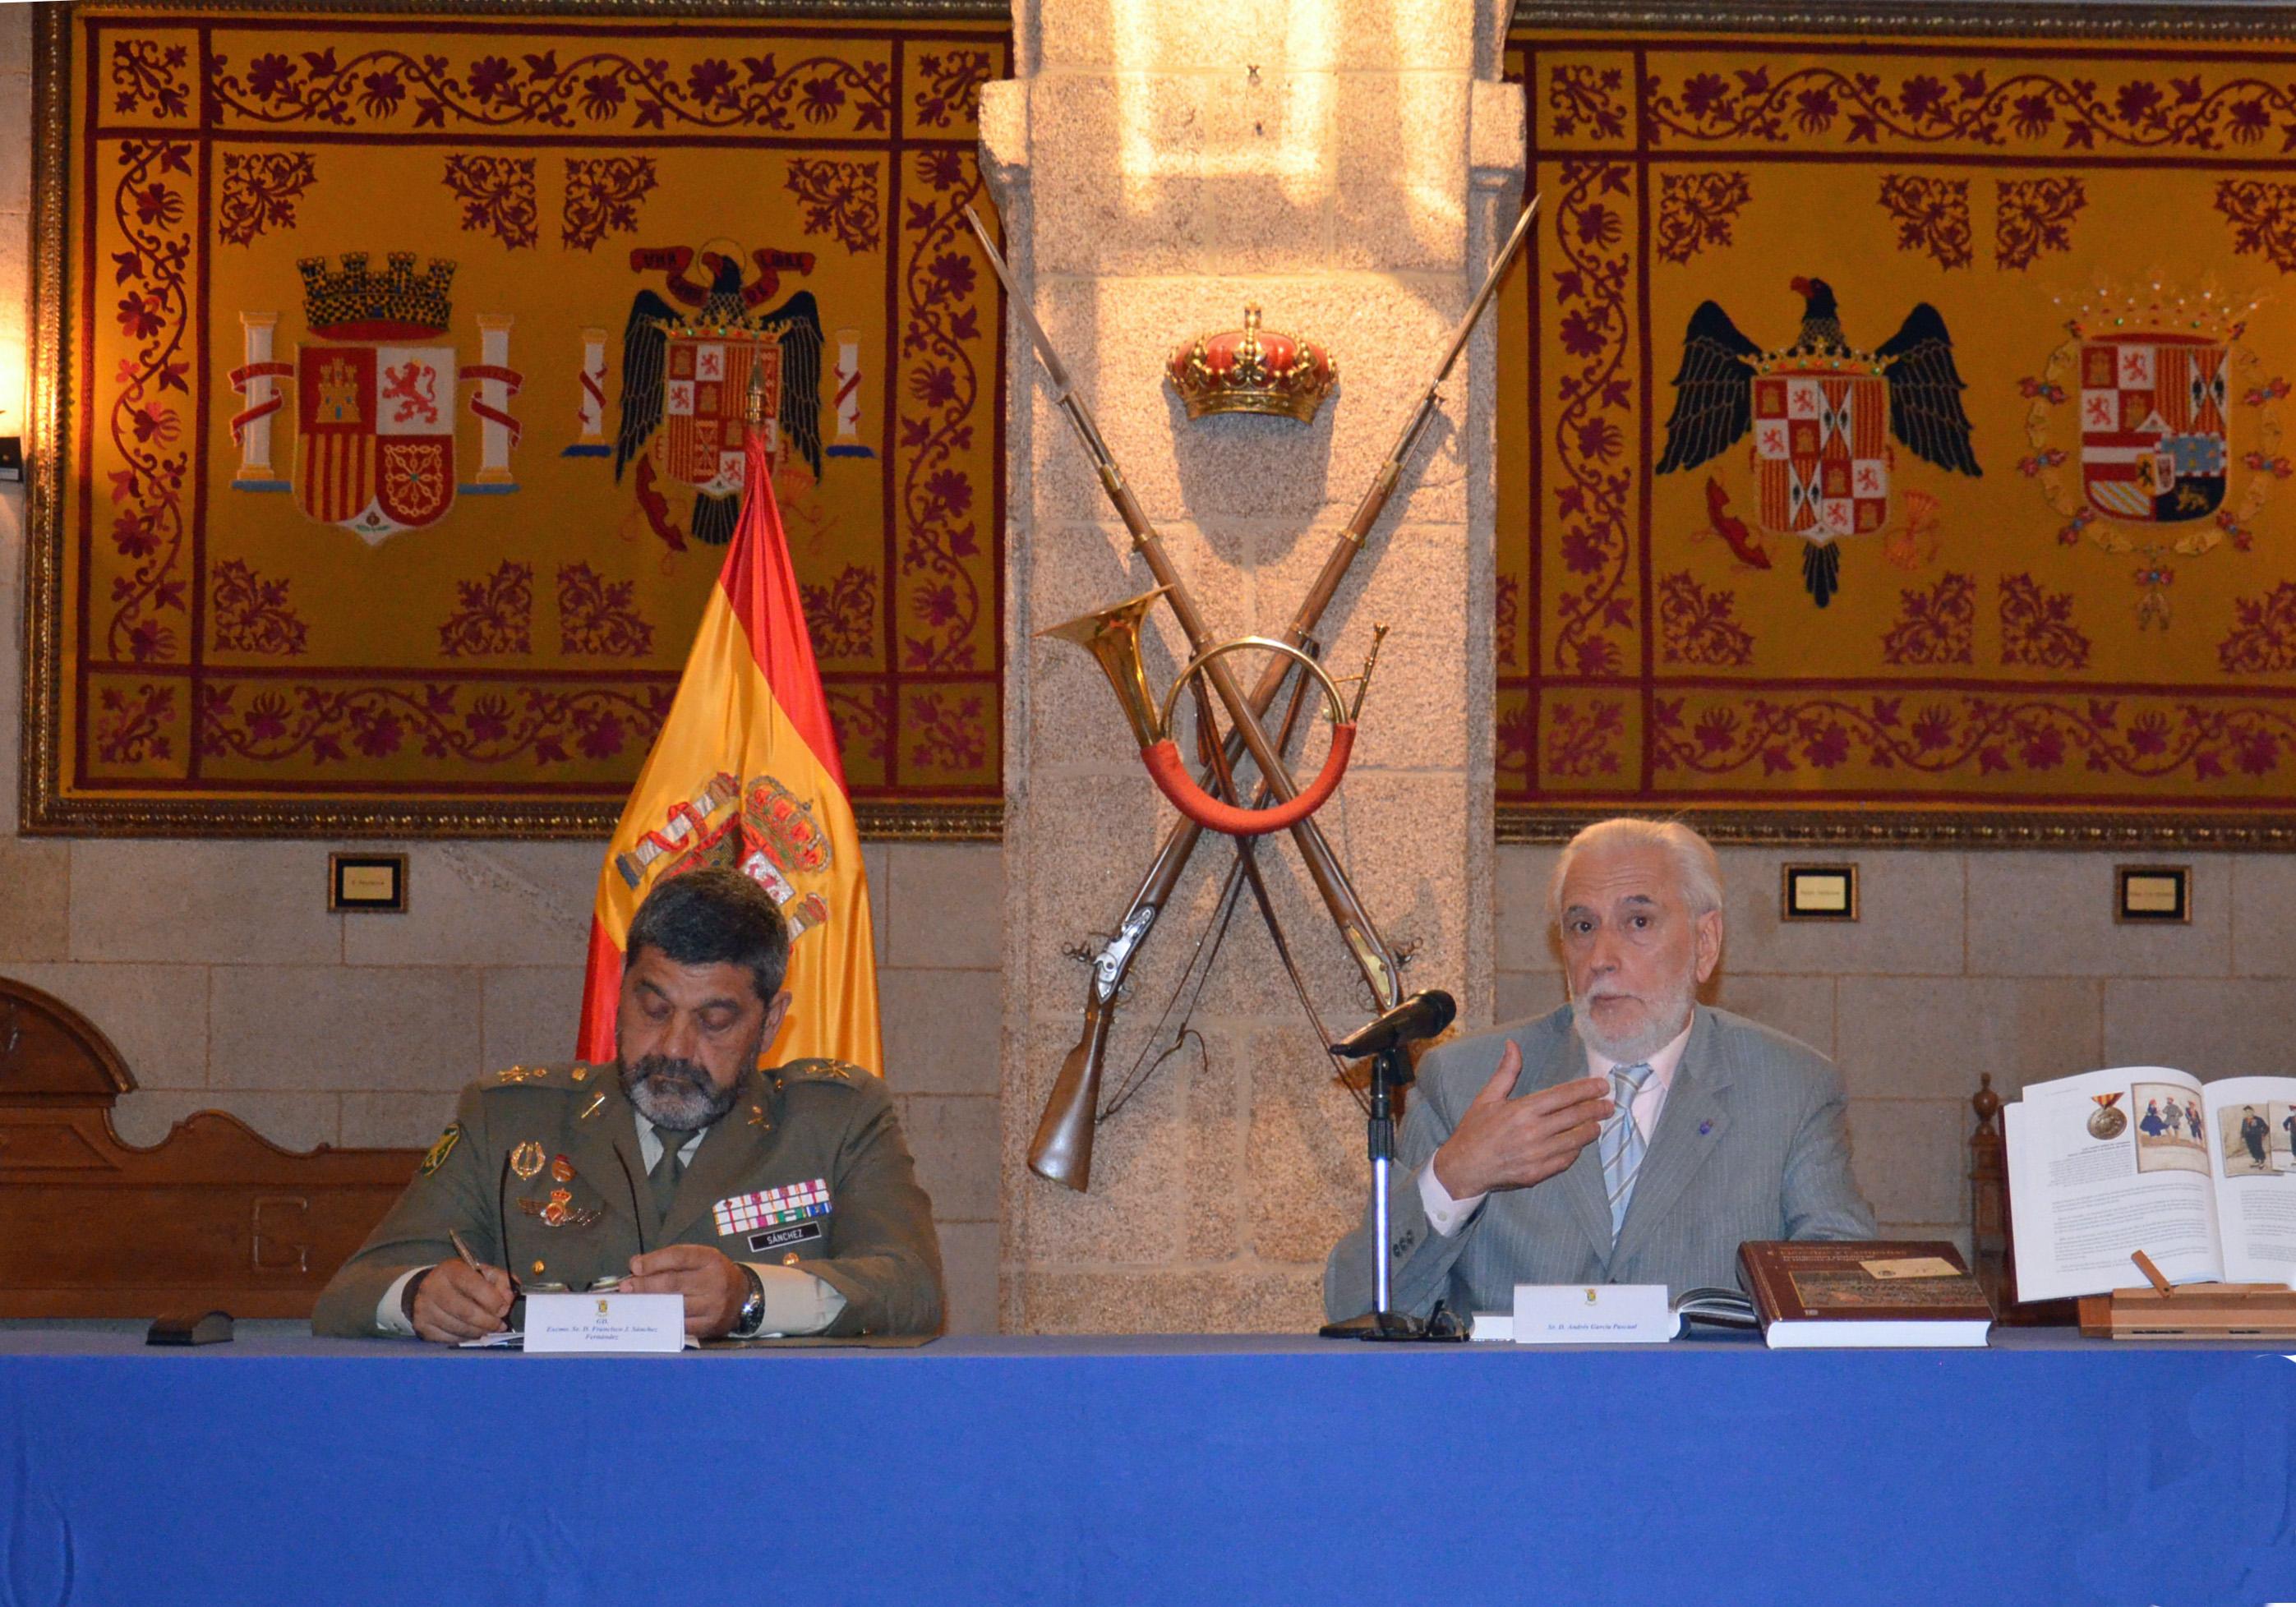 Excmo. Sr. D. Francisco Javier Sánchez Fernández, General Jefe de la FLO y D. Andrés García Pascual.